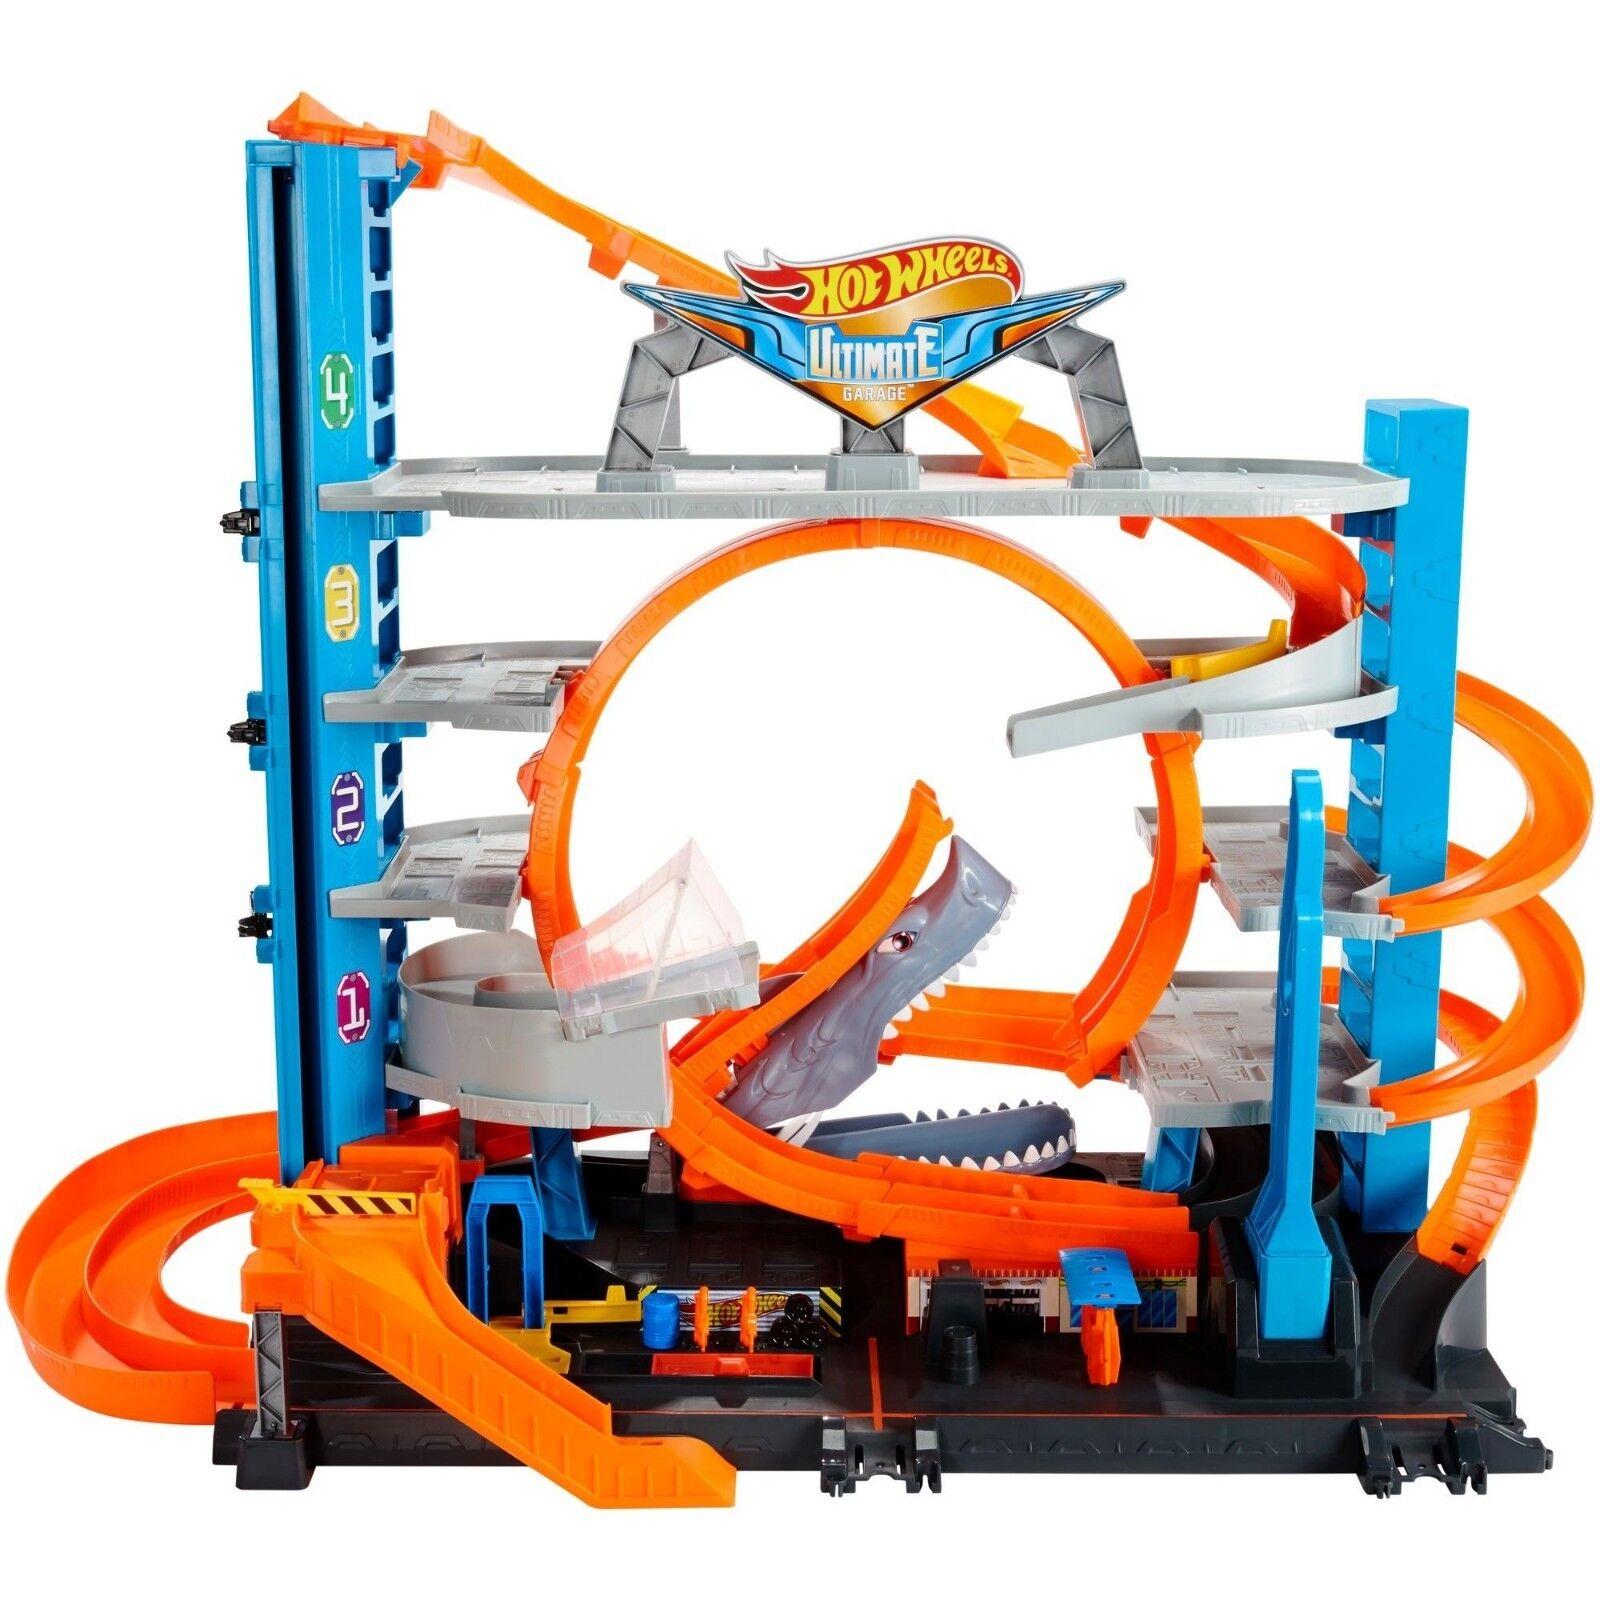 Hot Wheels Ultimate Garage Playset Toy For Kids Elevator Lau